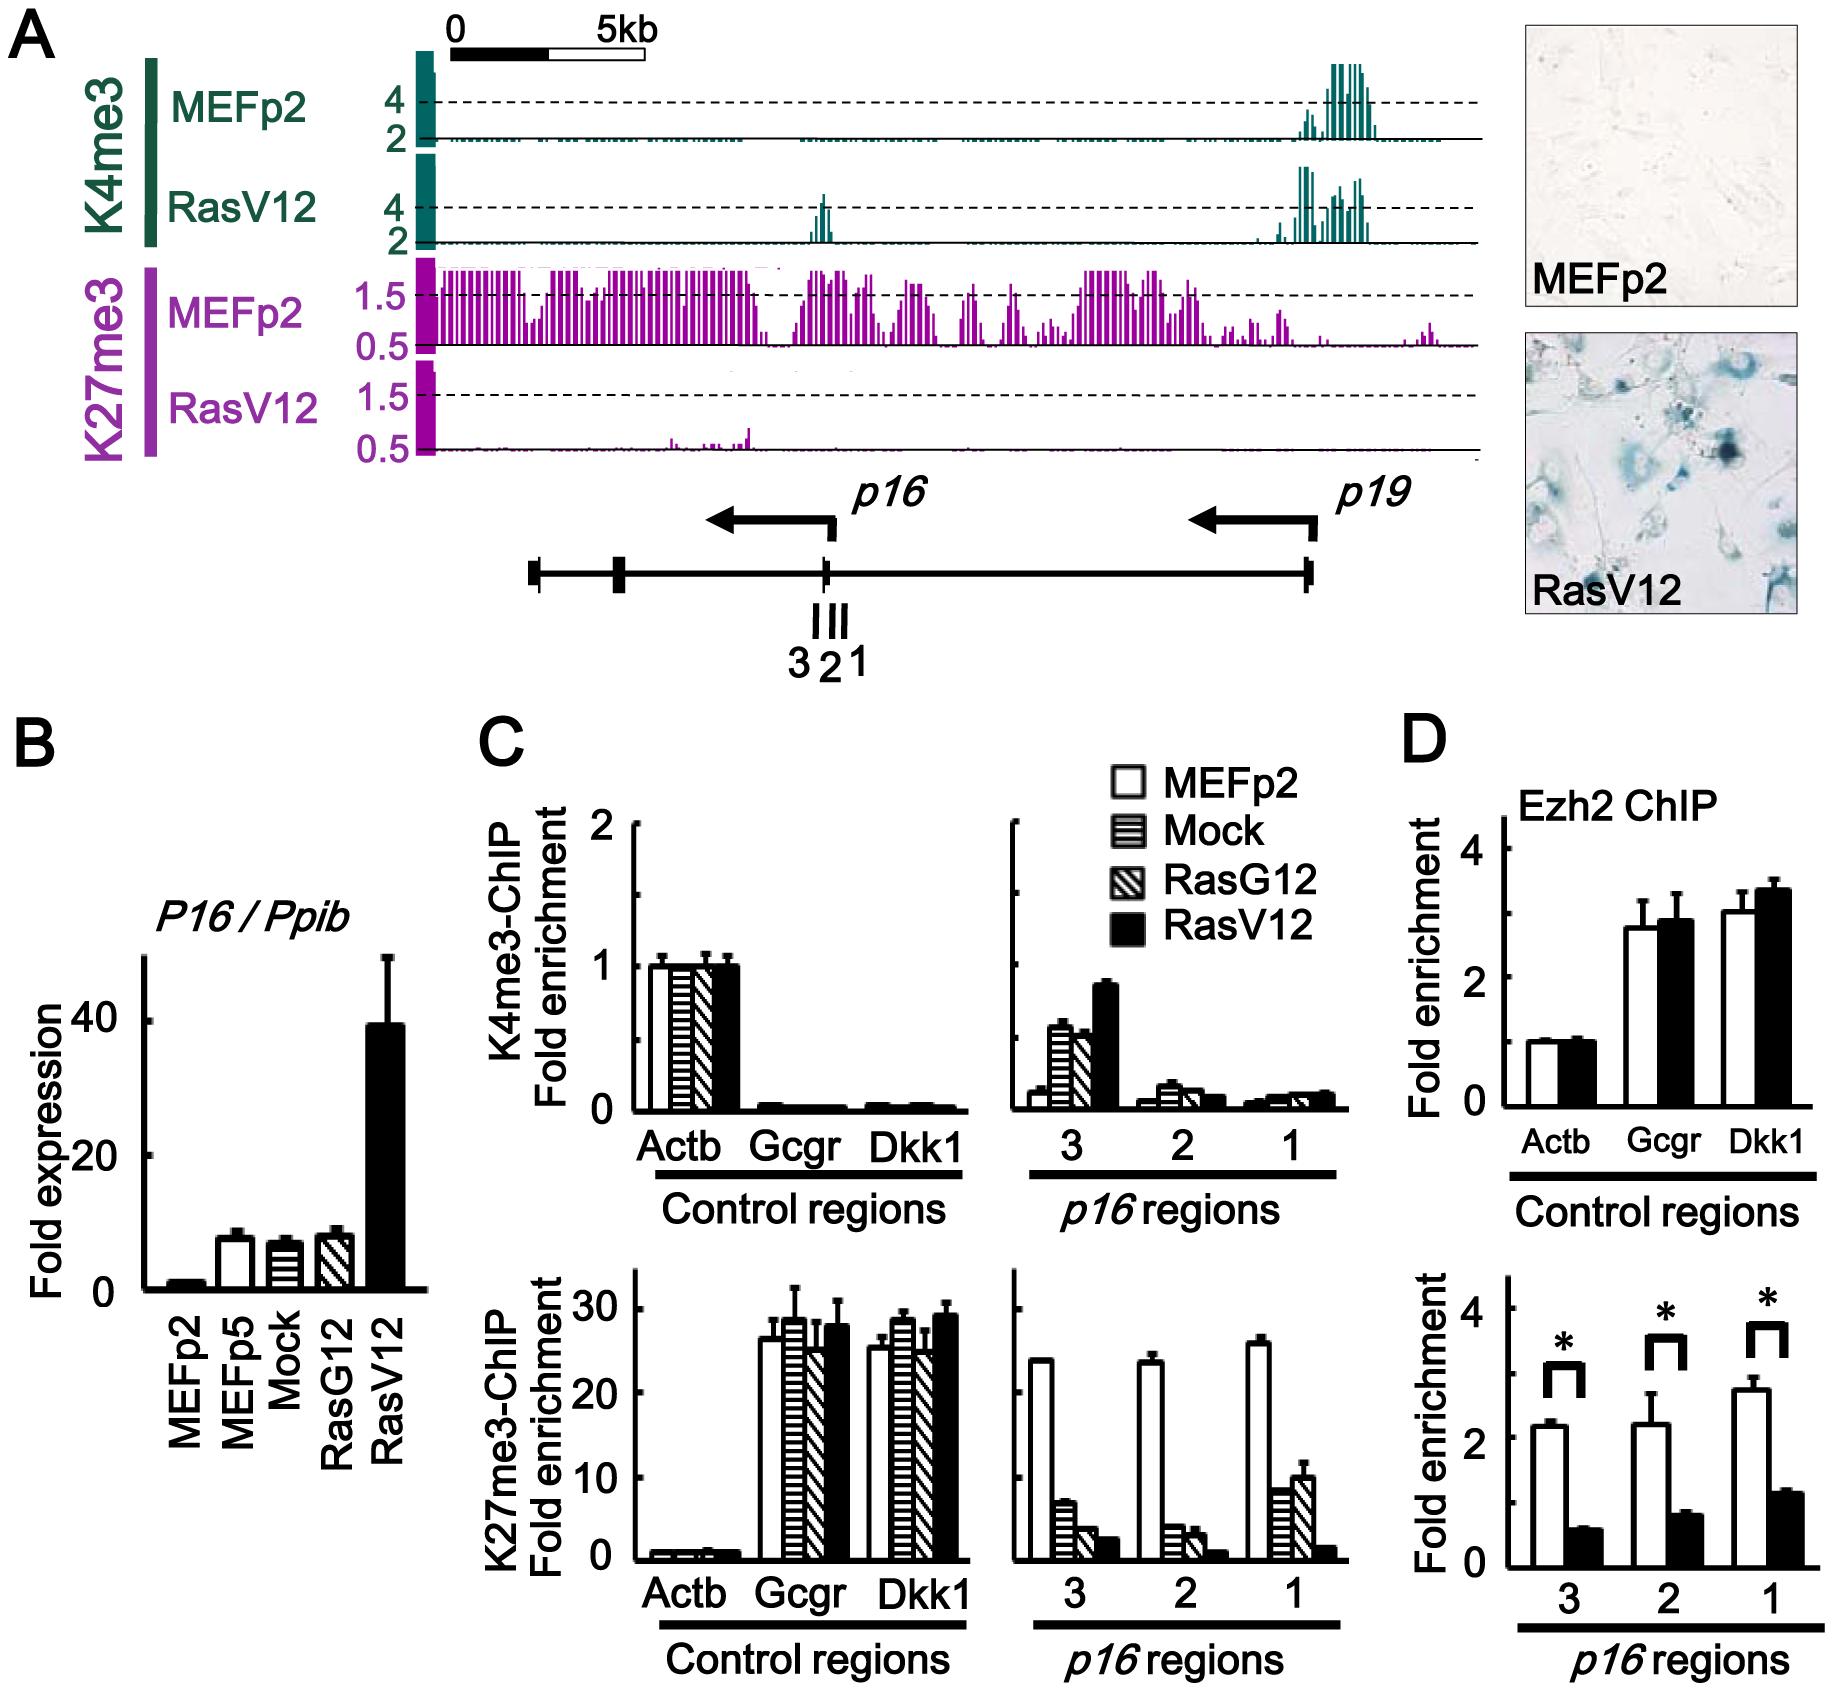 Epigenomic alteration of <i>Ink4a</i>-<i>Arf</i> locus.